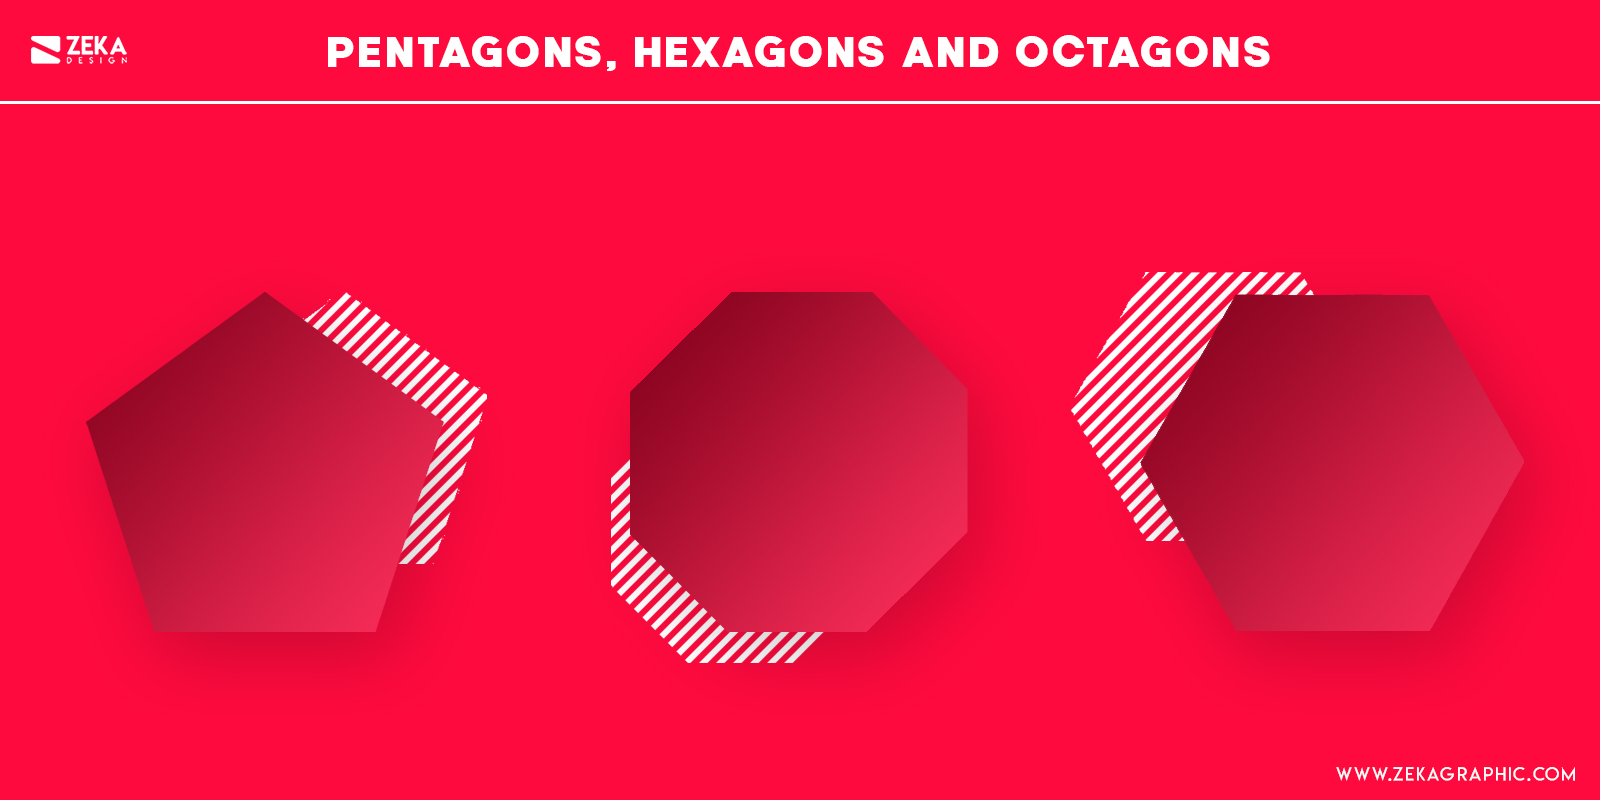 Pentagon Shapes Psychology in Graphic Design